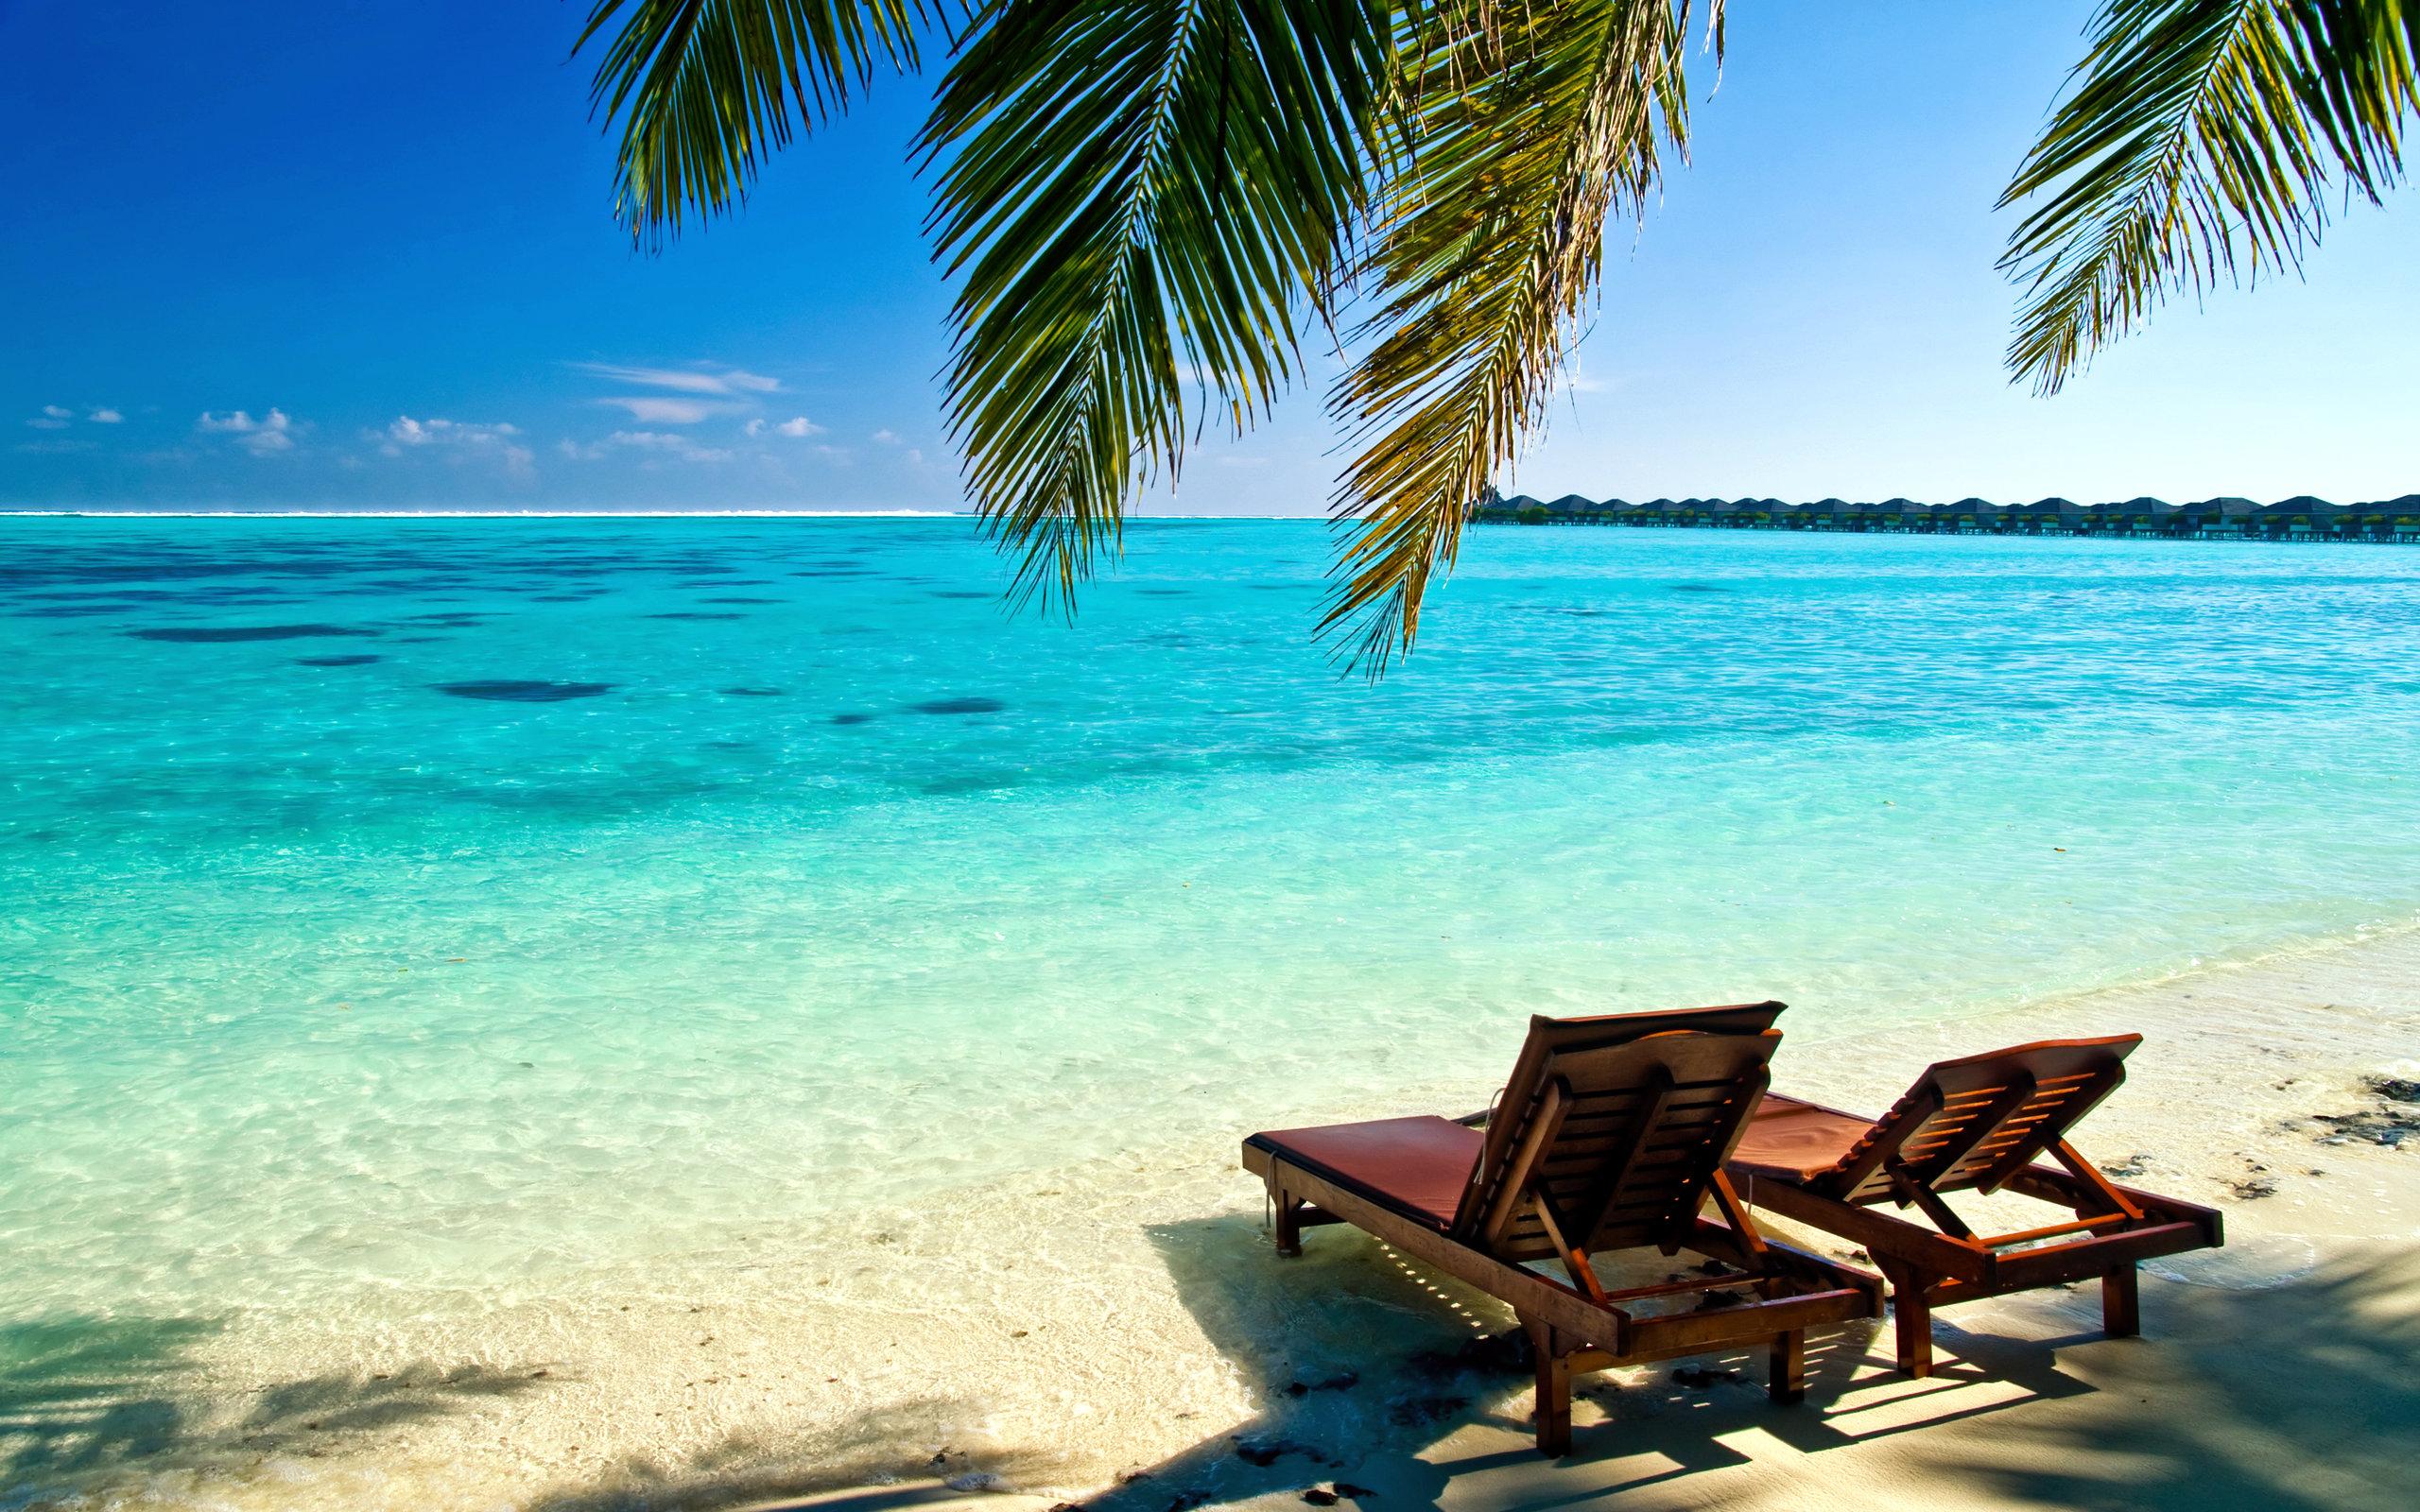 lovely vacation wallpaper 46329